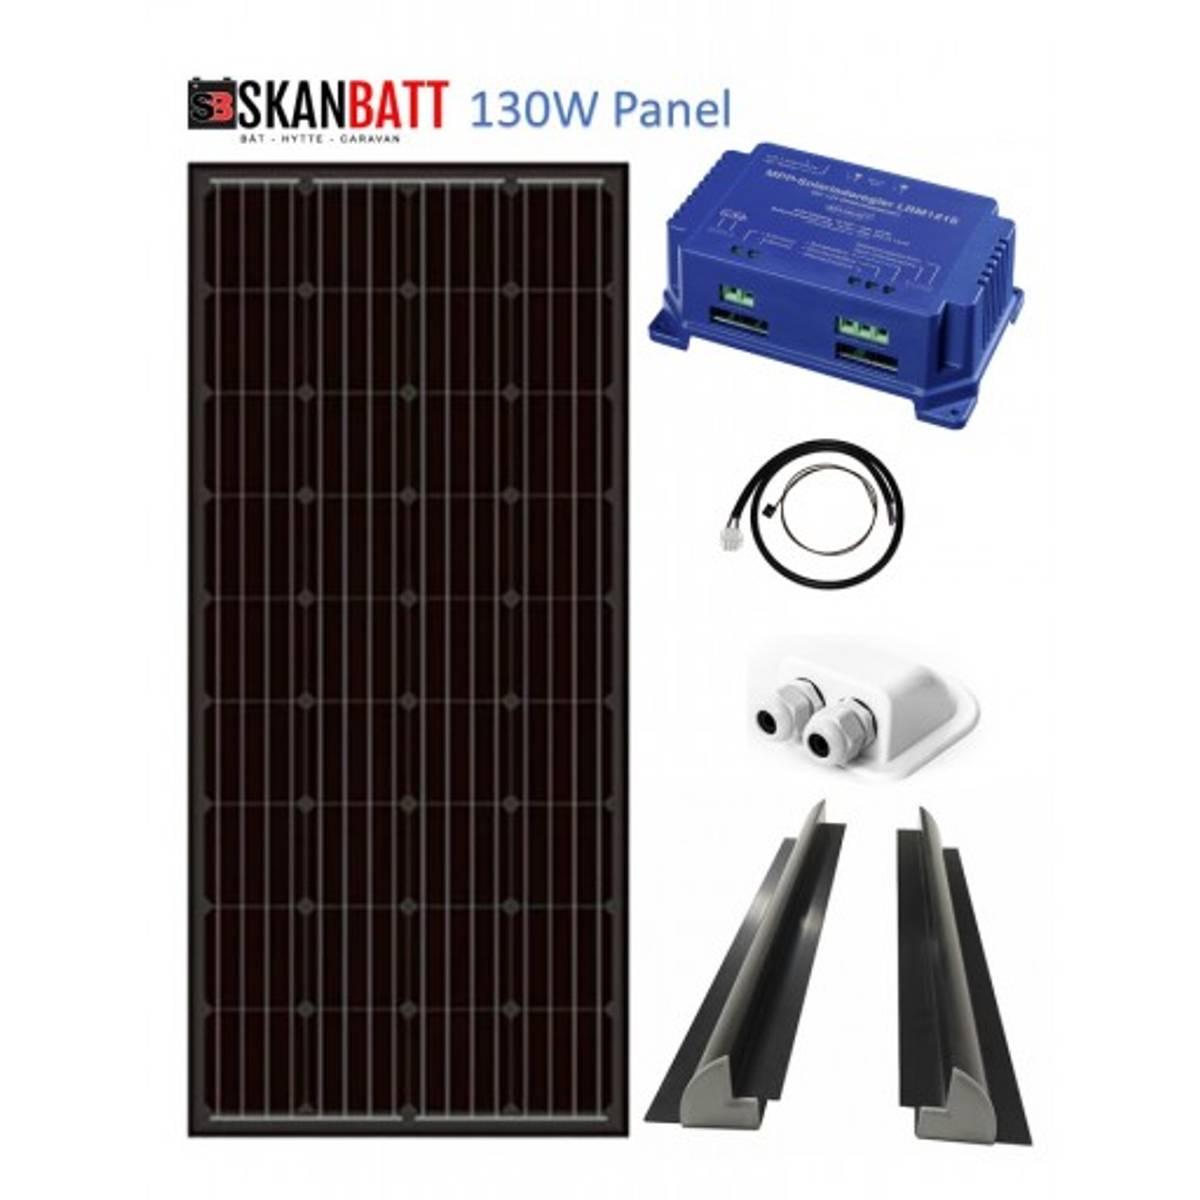 SKANBATT Solcellepakke Bobil (Schaudt EBL) 130W Schaudt LRM1218B